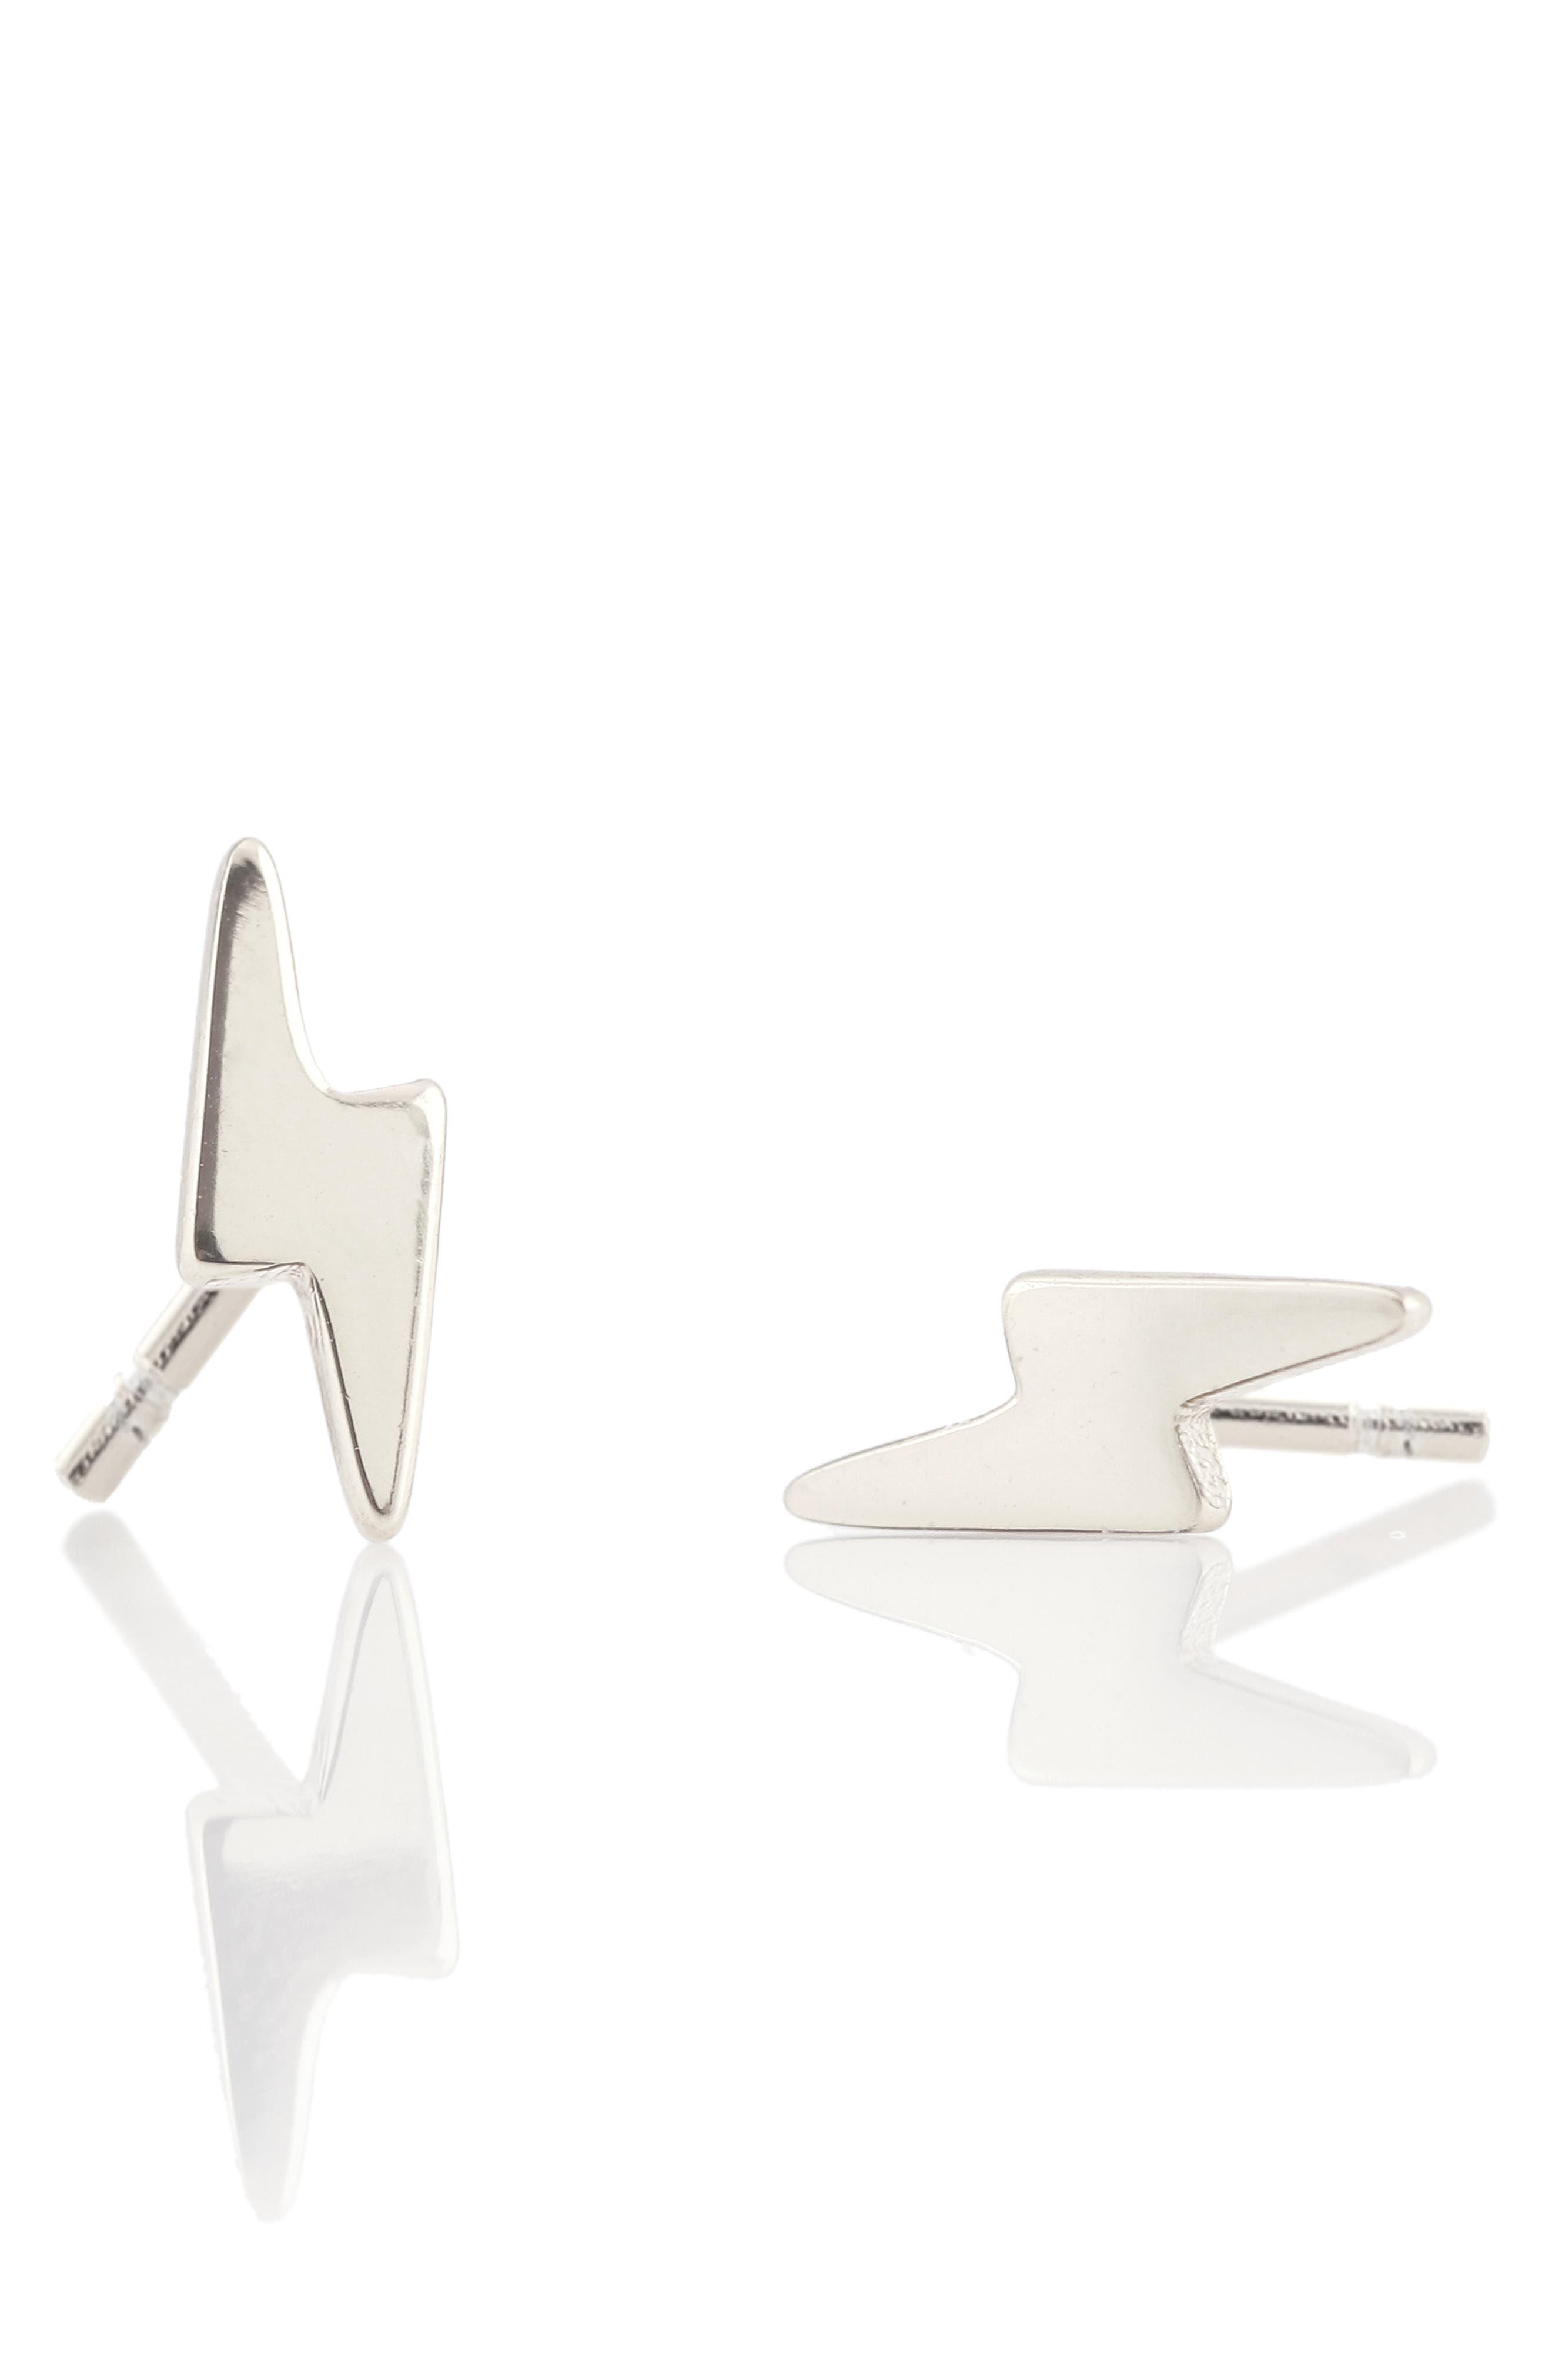 Pavé Lightning Bolt Stud Earrings,                         Main,                         color, Silver